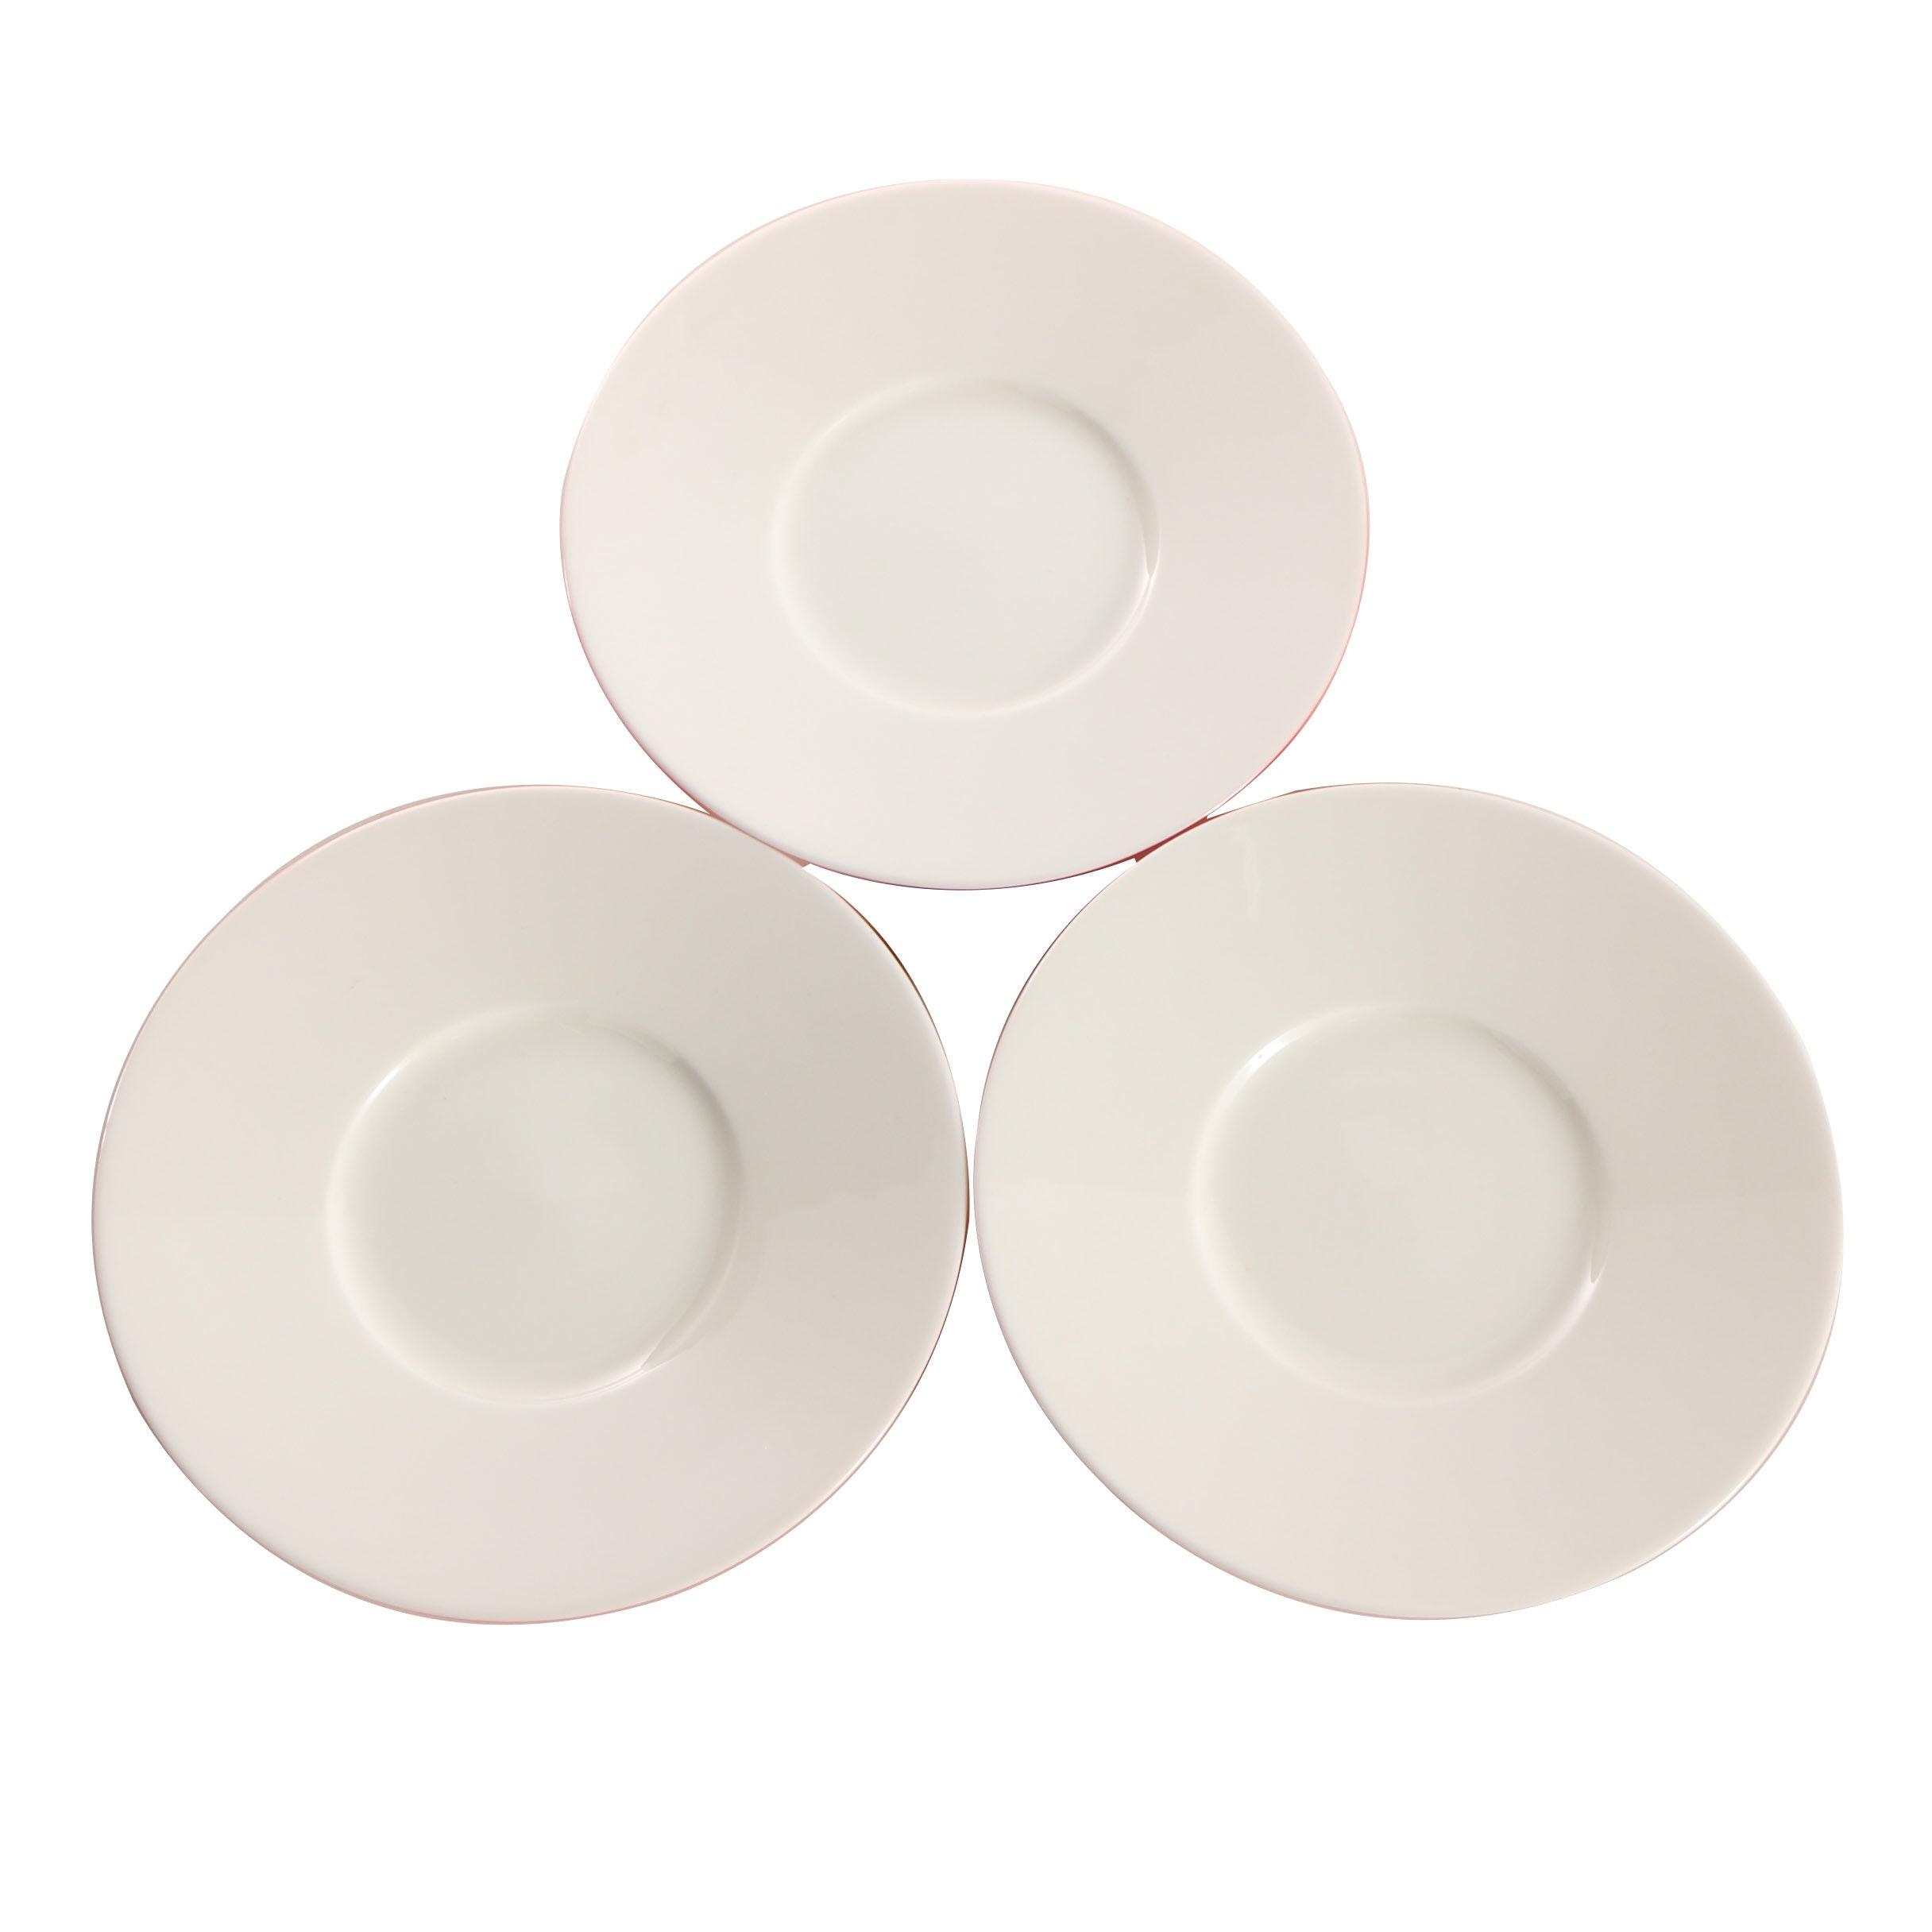 "Oscar Tusquets Blanca Porcelain ""Victoria"" Dinnerware"